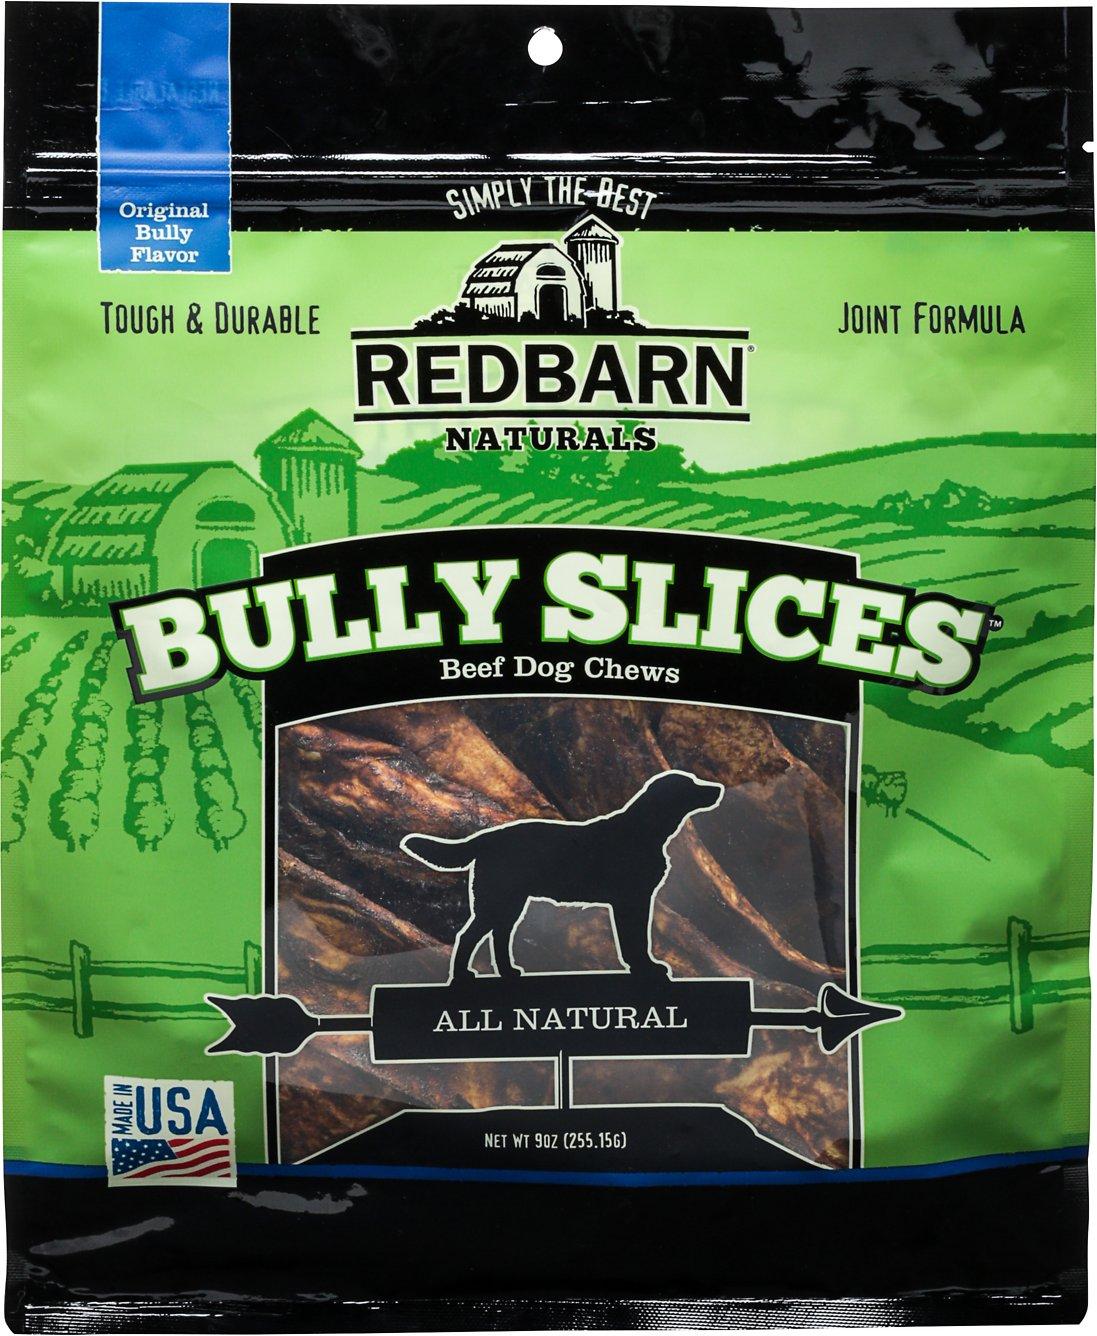 Redbarn Naturals Bully Slices Dog Treats Image